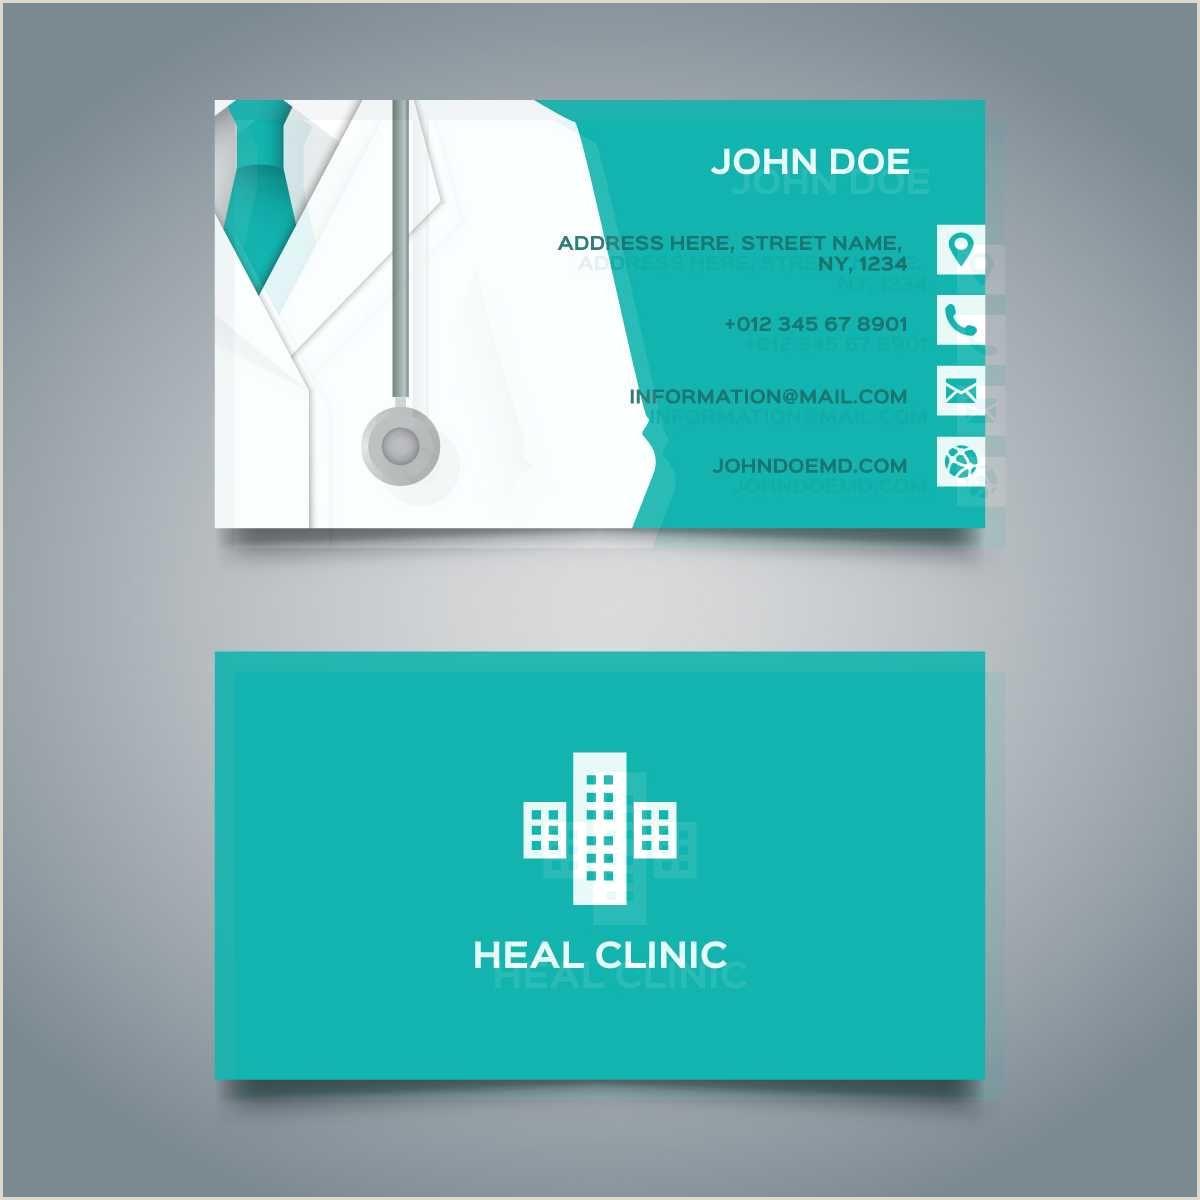 Facebook Logos For Business Cards Blue Medical Card Free